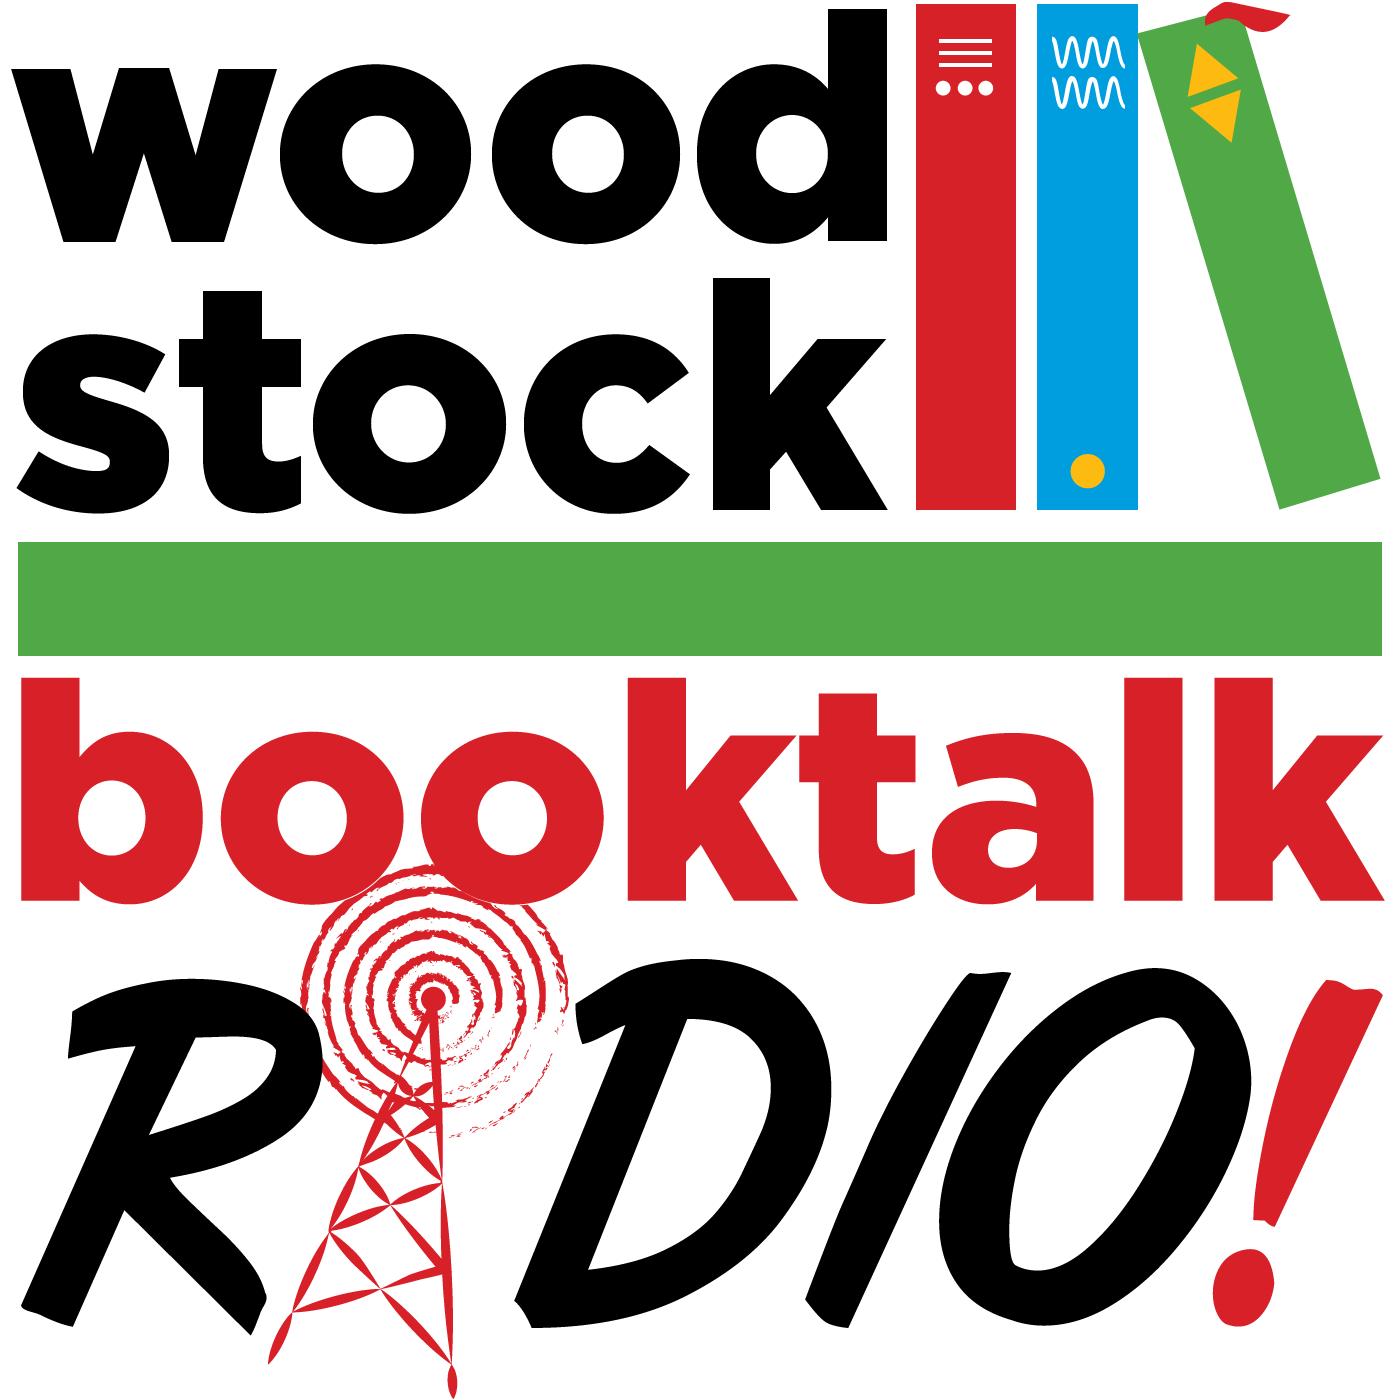 Woodstock Booktalk with Martha Frankel show art